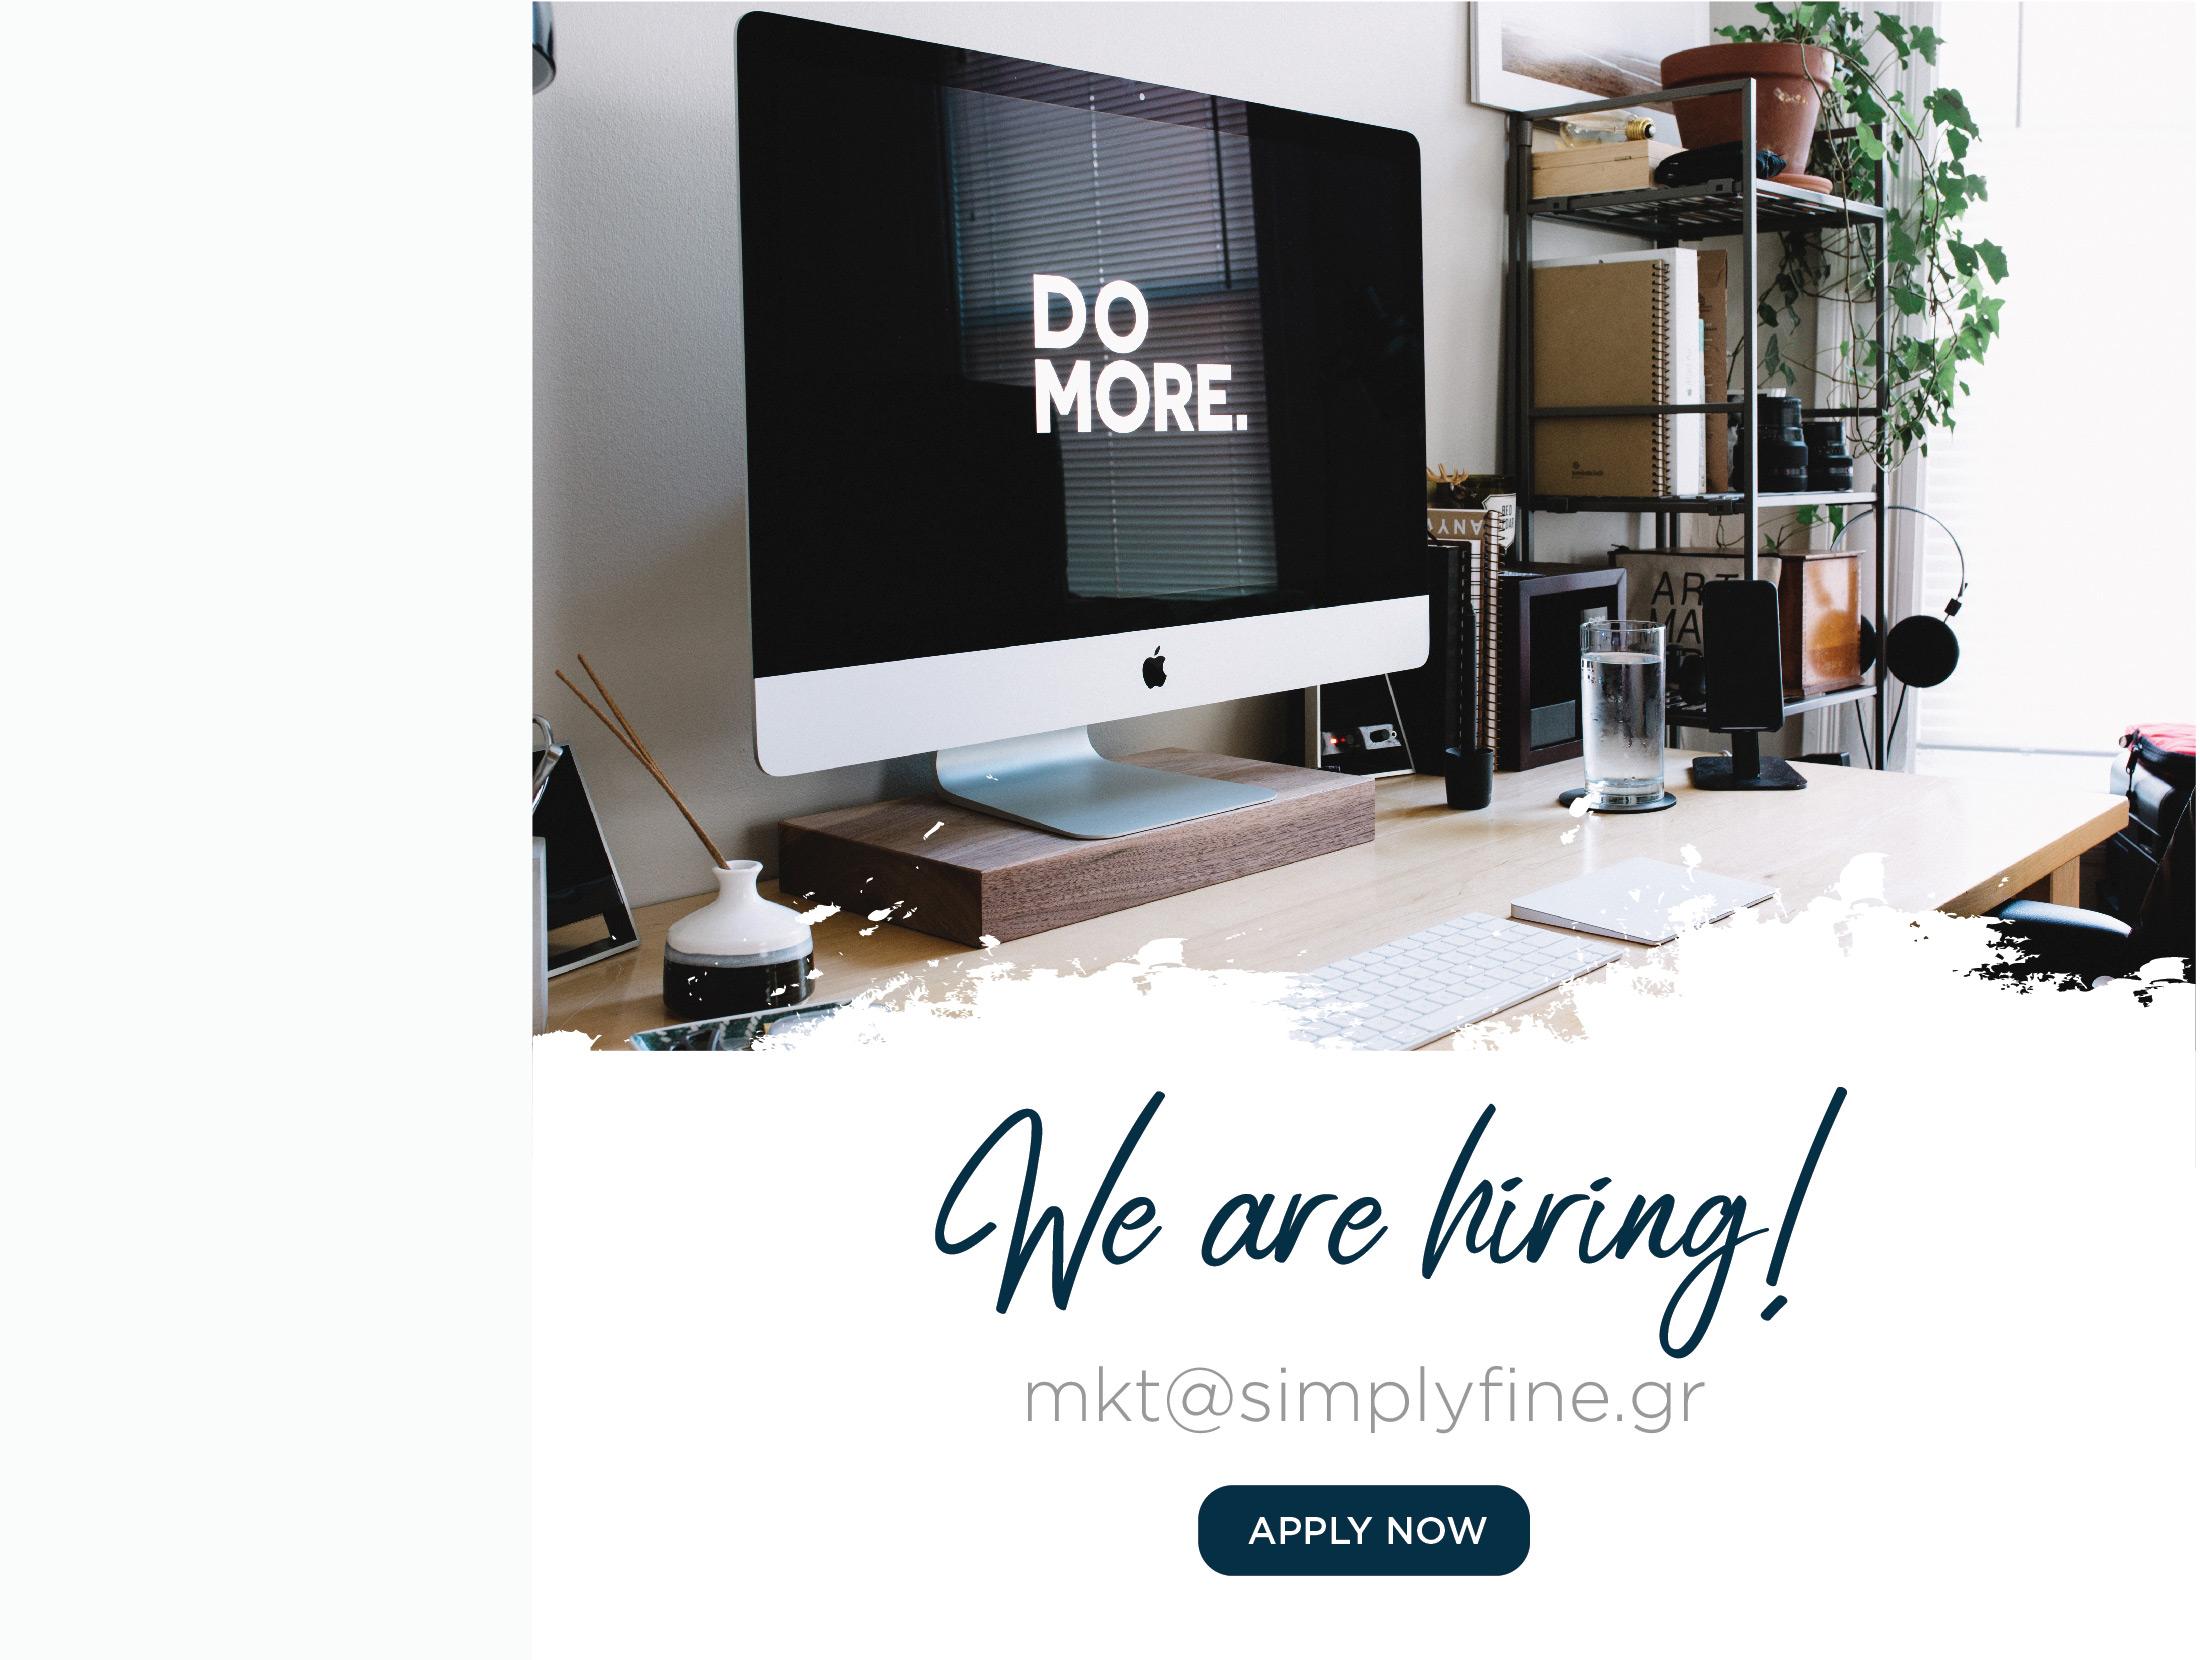 we are hiring - Simplyfine